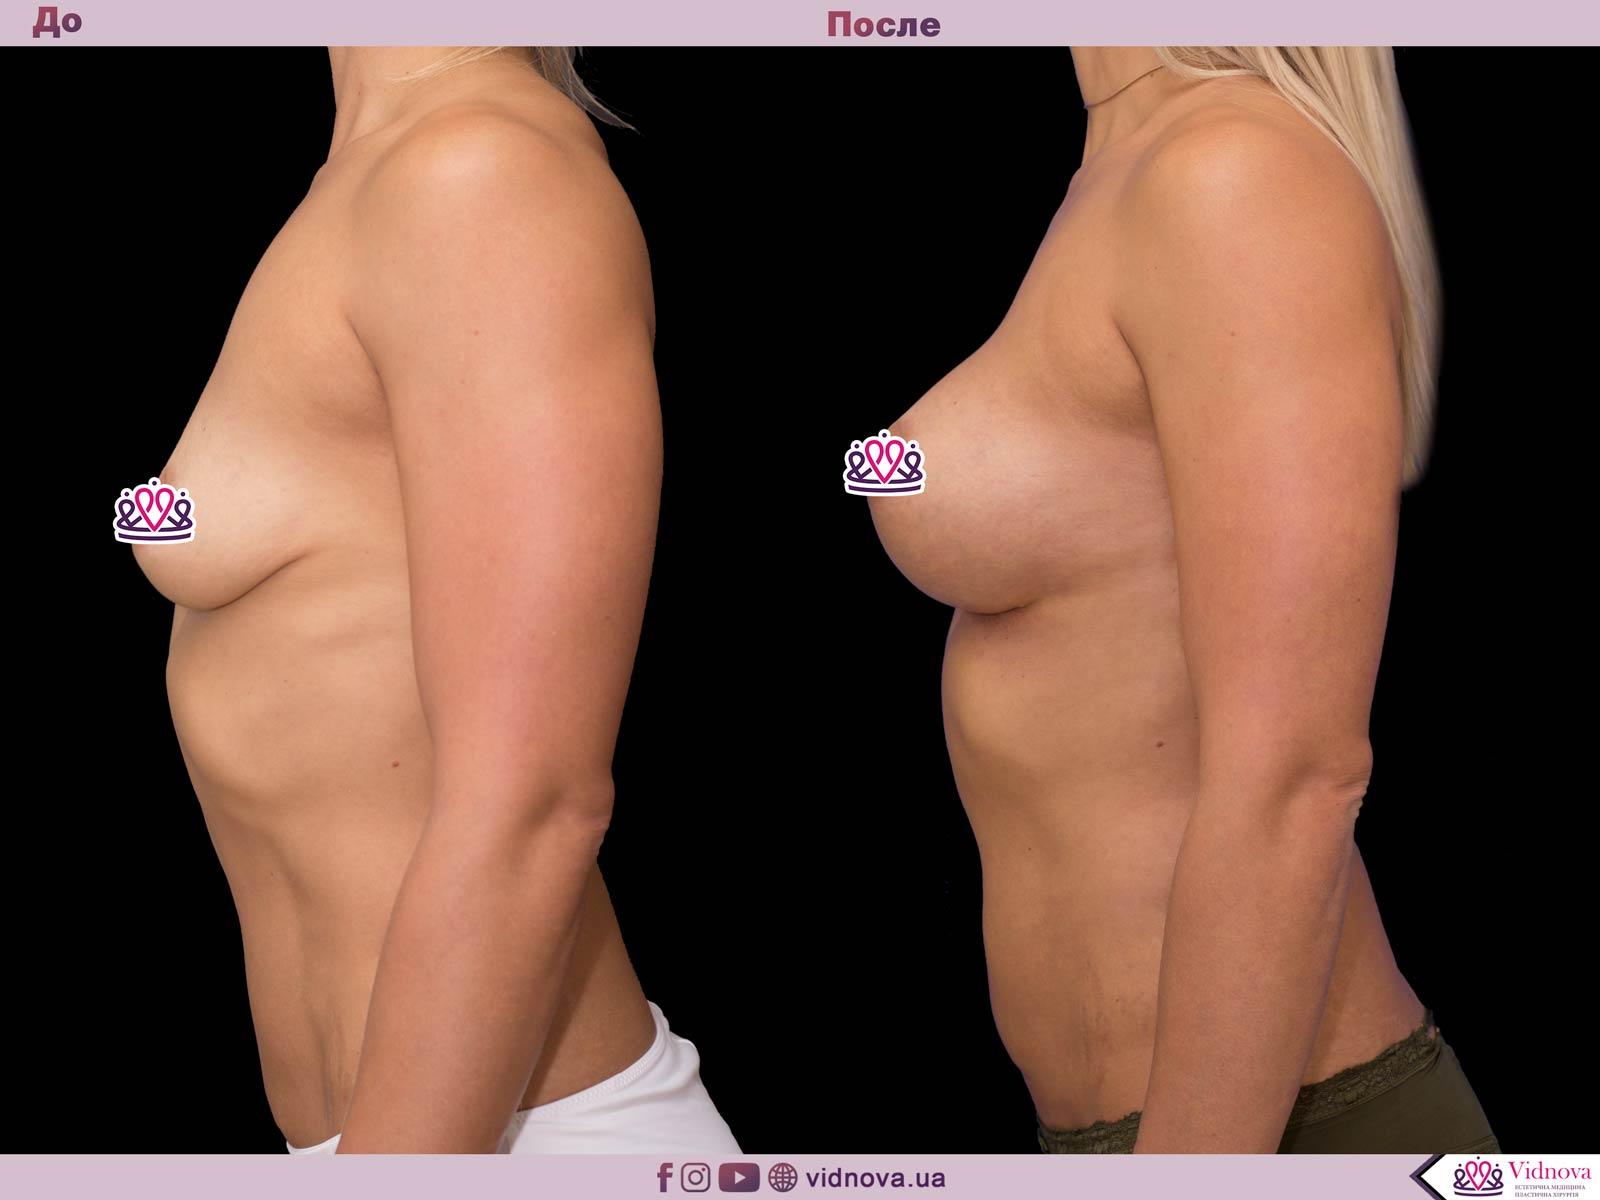 Увеличение груди: Фото ДО и ПОСЛЕ - Пример №35-3 - Клиника Vidnova